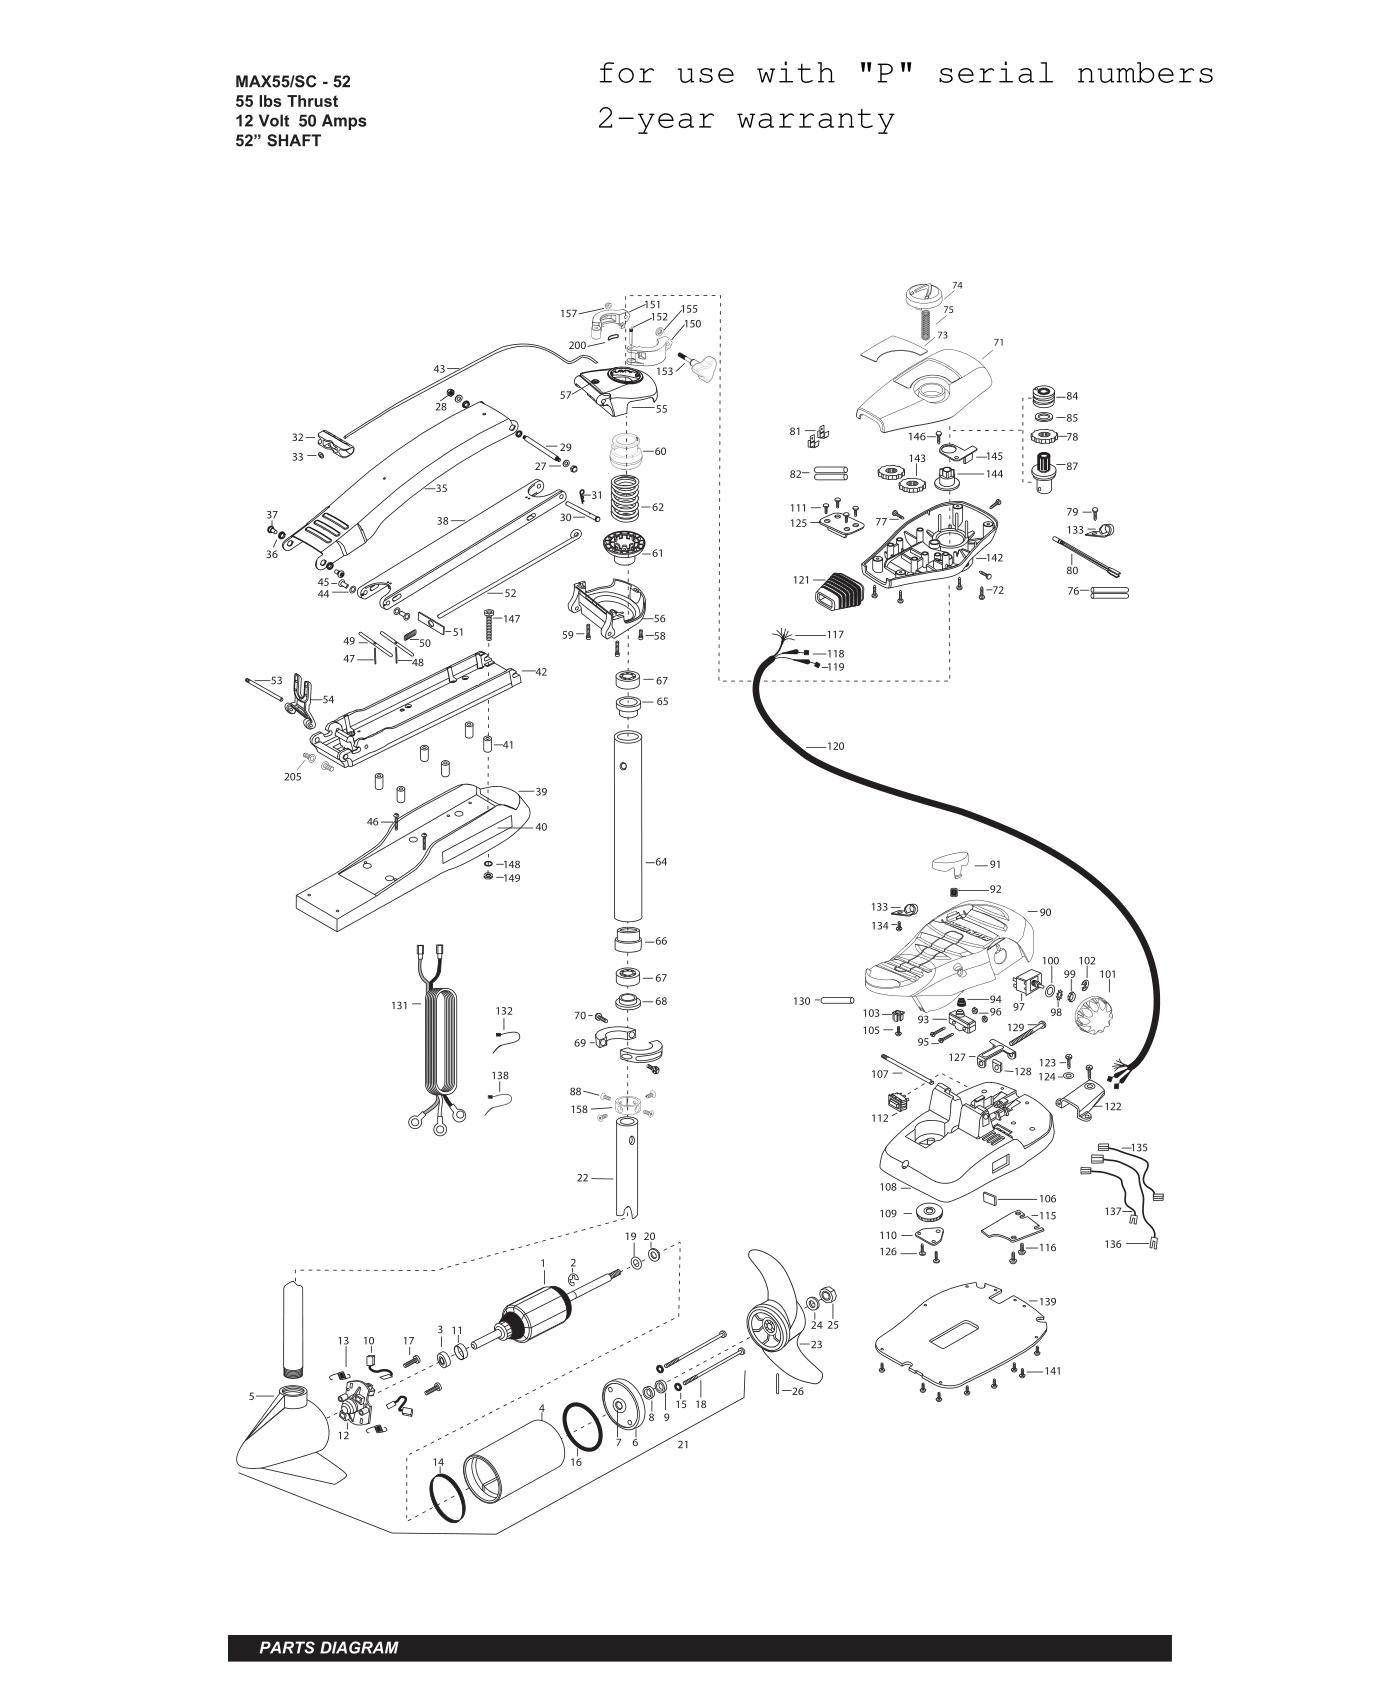 2015-mk-max55sc-52inch-1.png